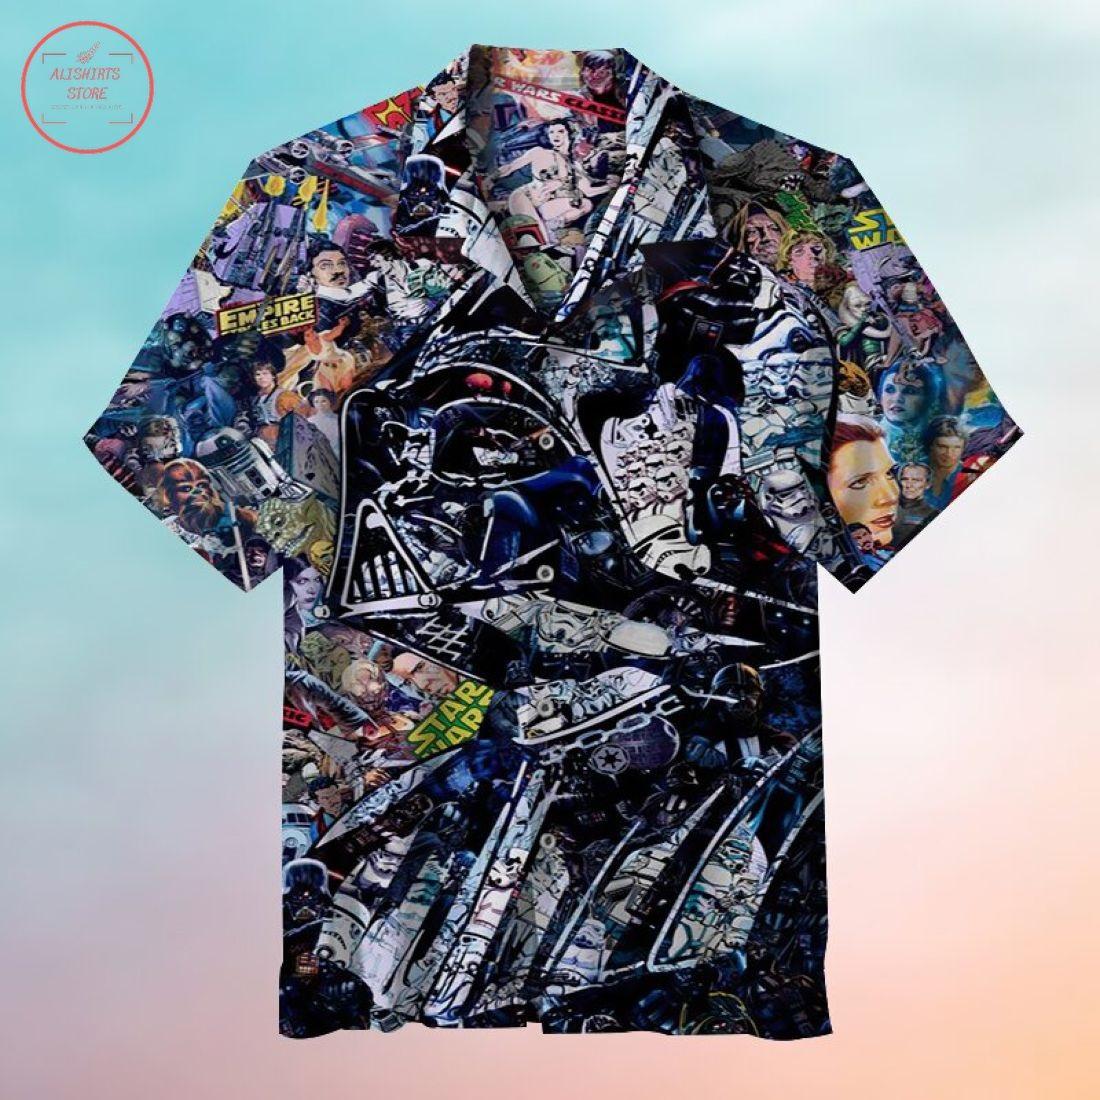 Falling into the dark side of the force Hawaiian shirt